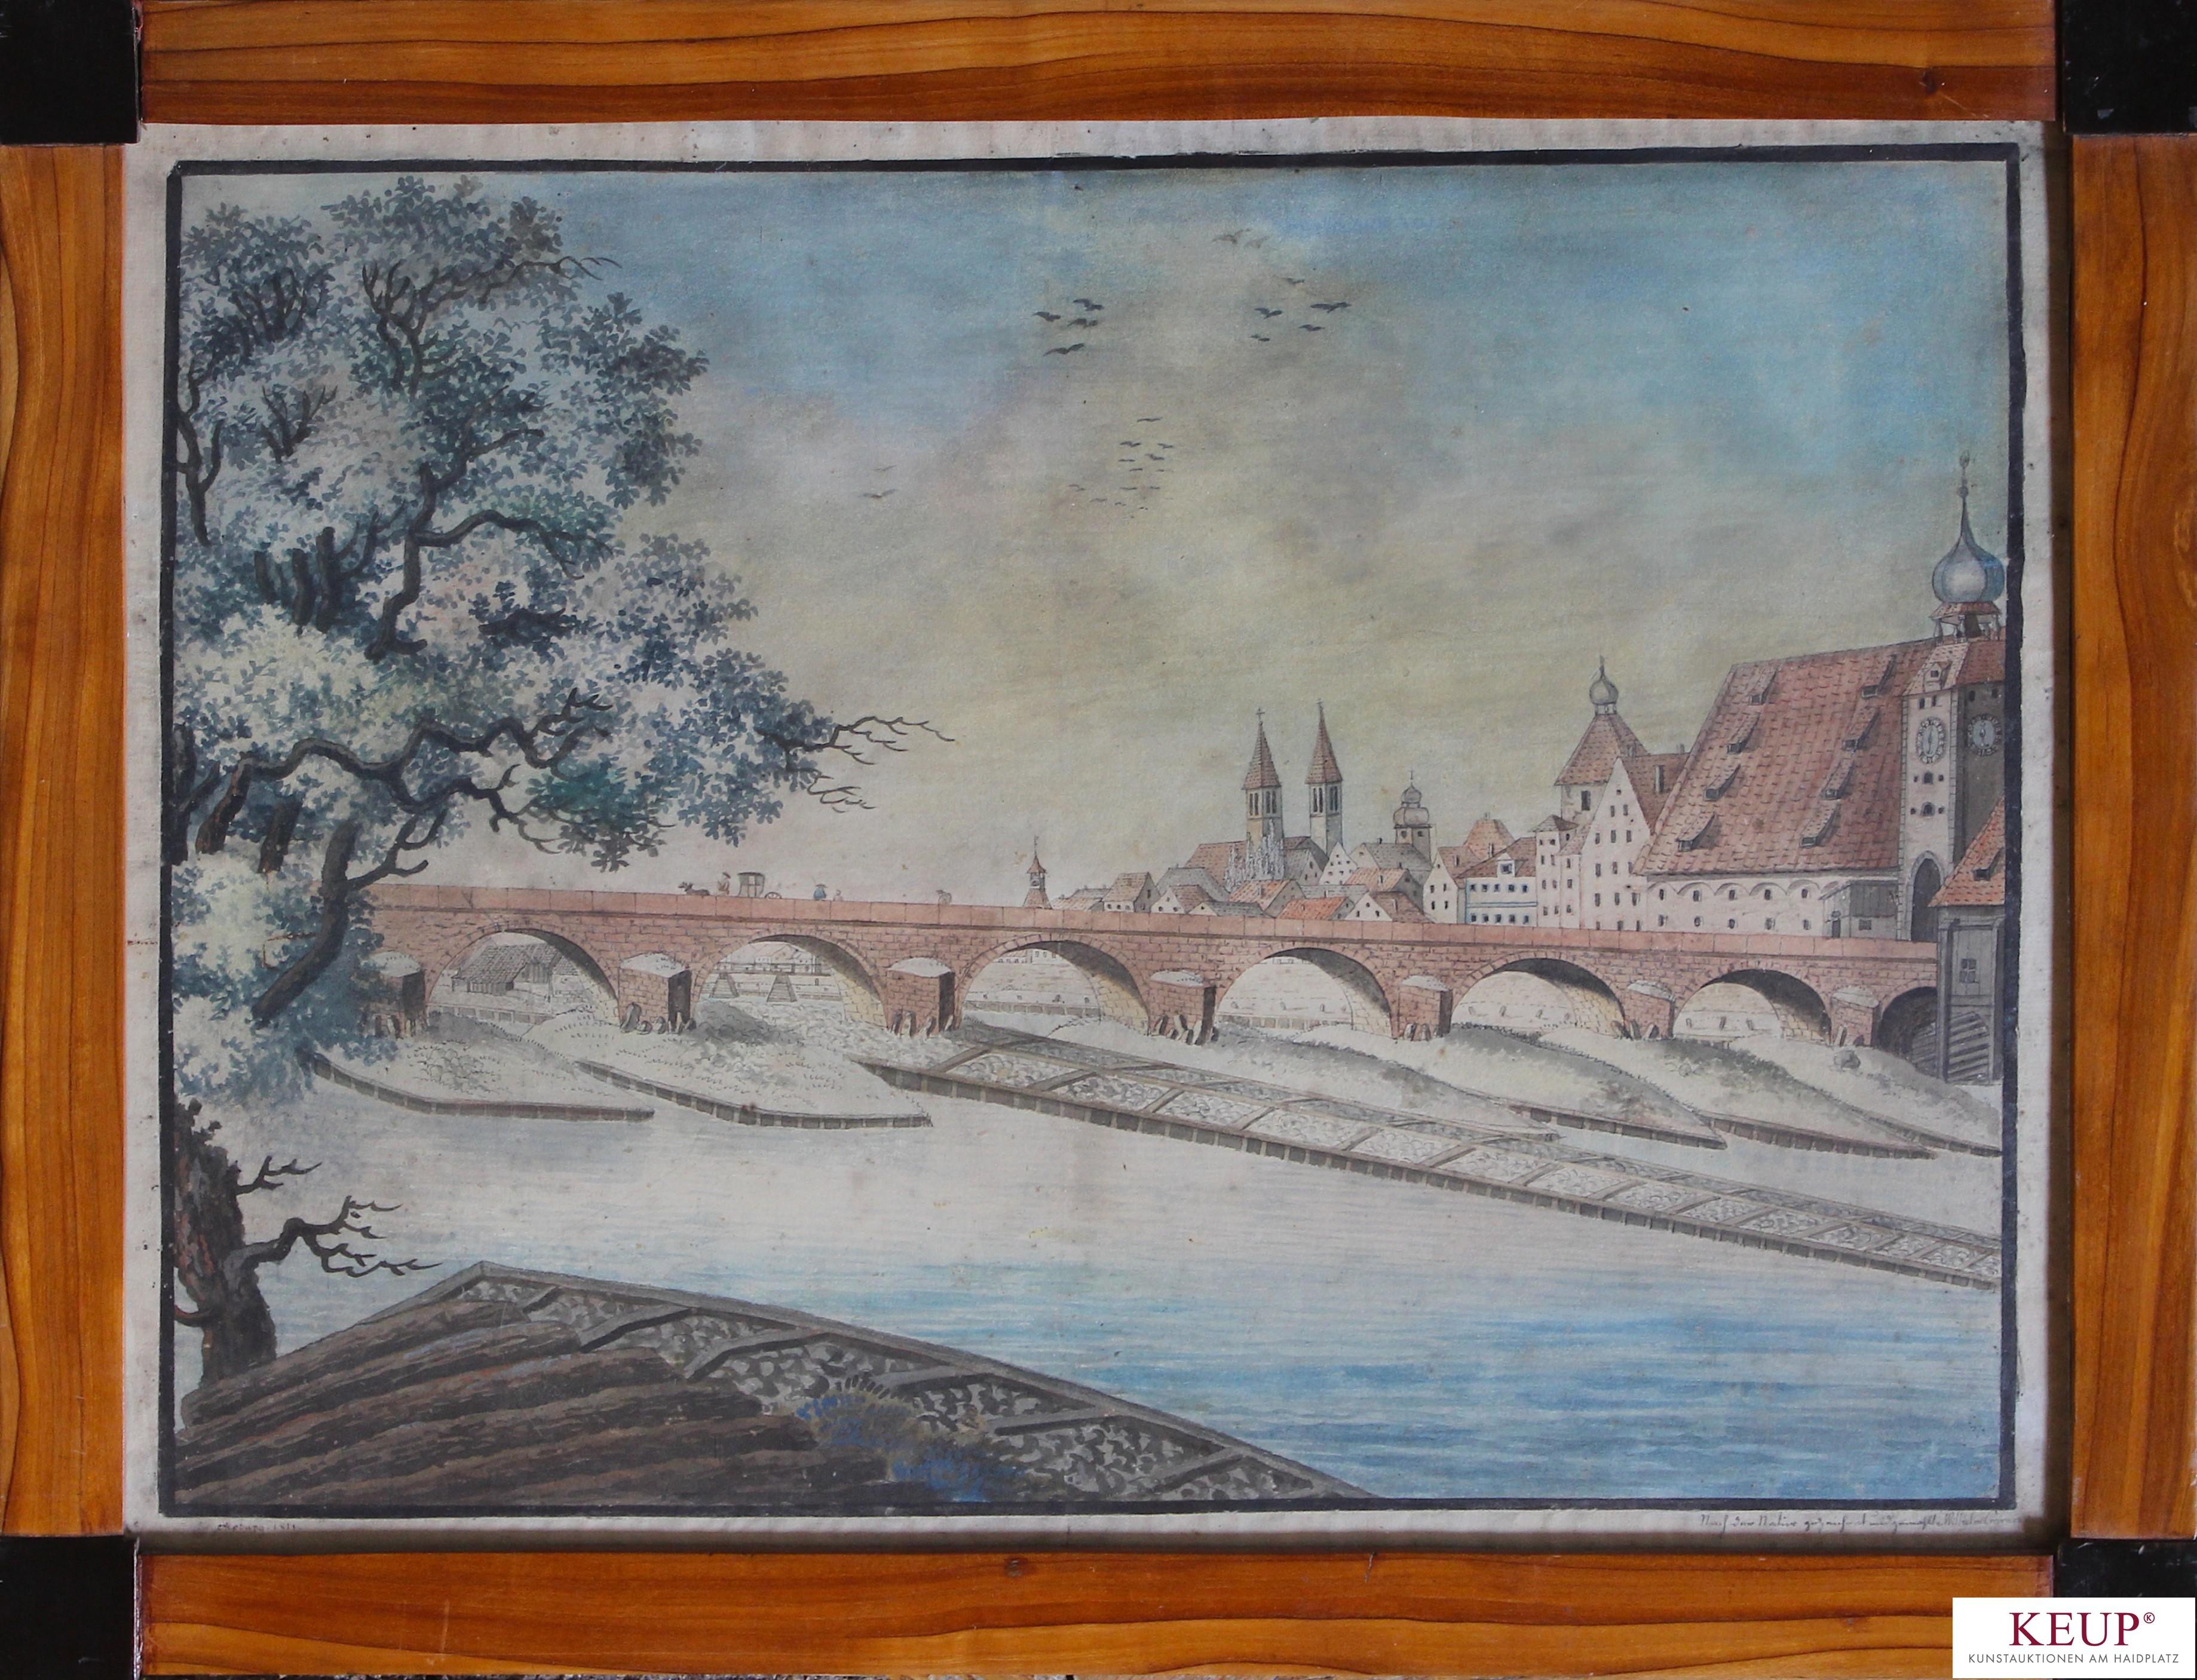 Keup Auktionen Regensburg